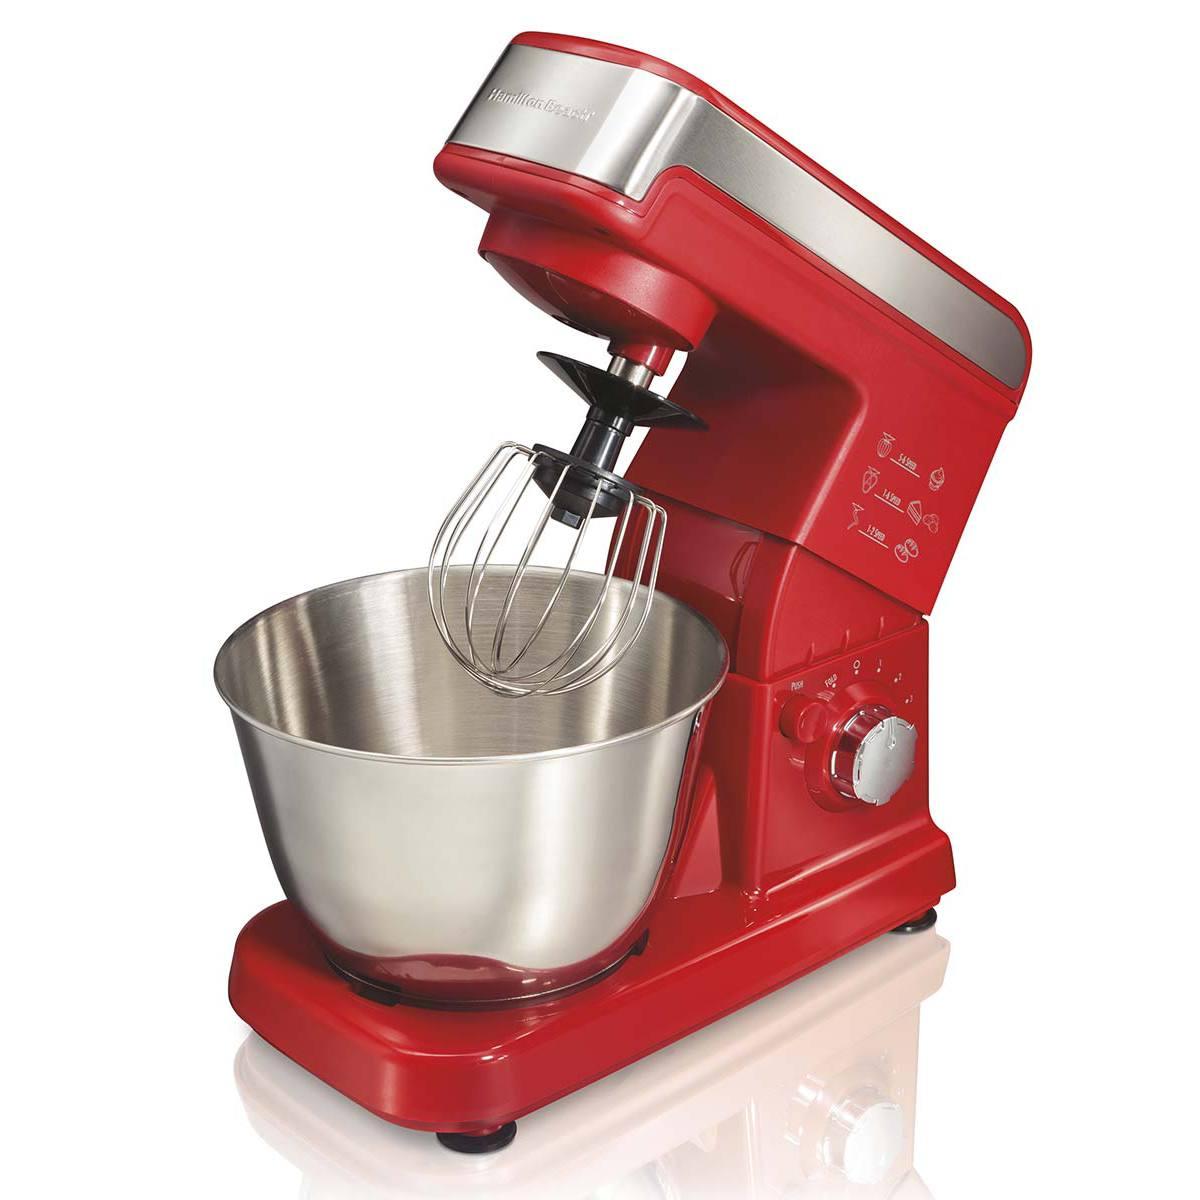 Hamilton Beach 6 Speed Stand Mixer 63324 Red